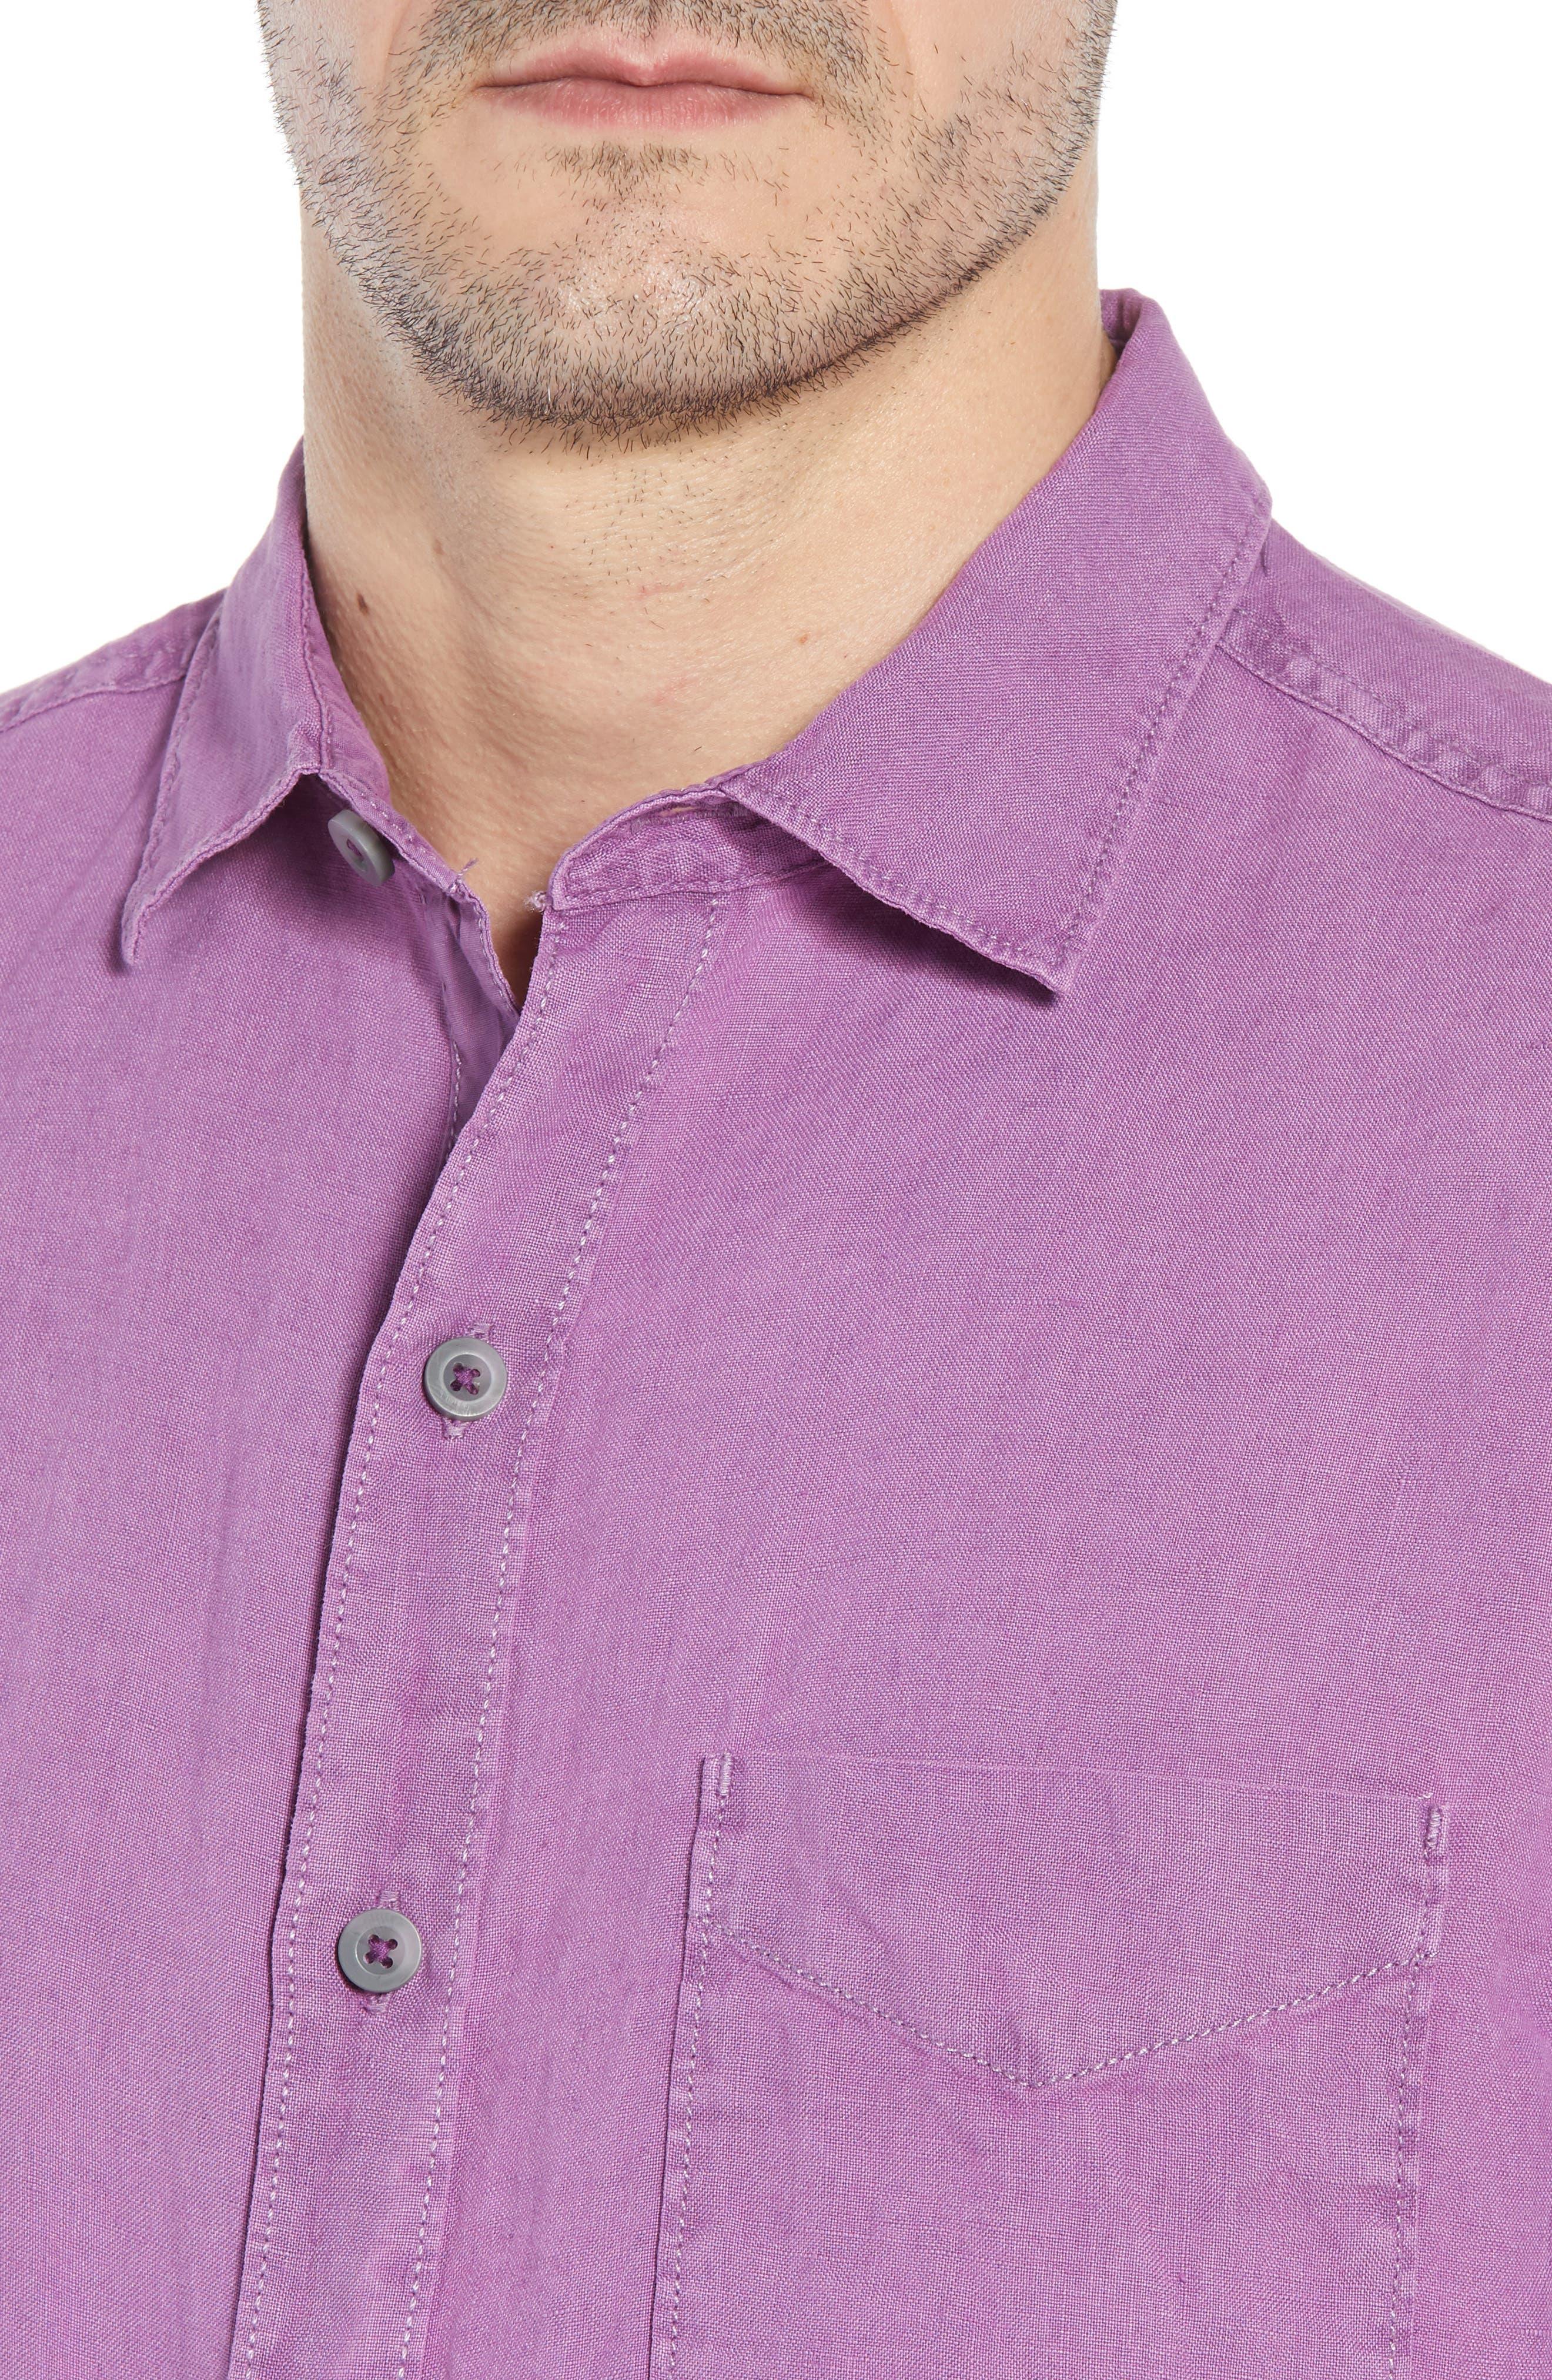 Seaspray Breezer Linen Sport Shirt,                             Alternate thumbnail 2, color,                             Sparkling Grape